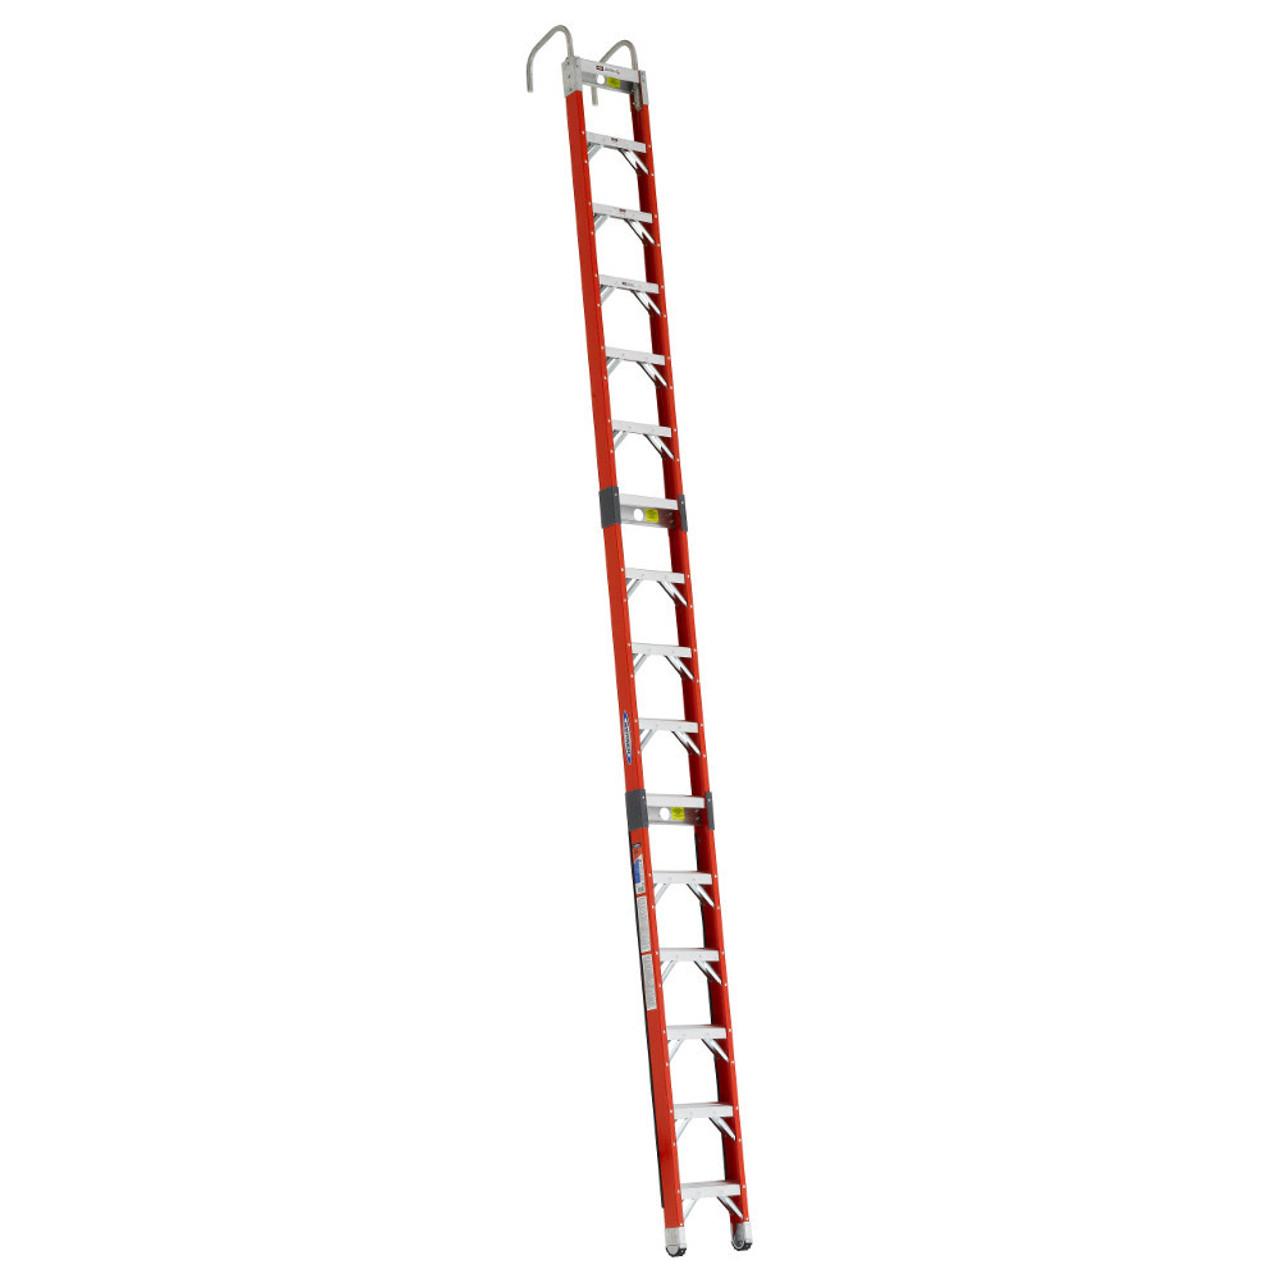 Posting Ladders